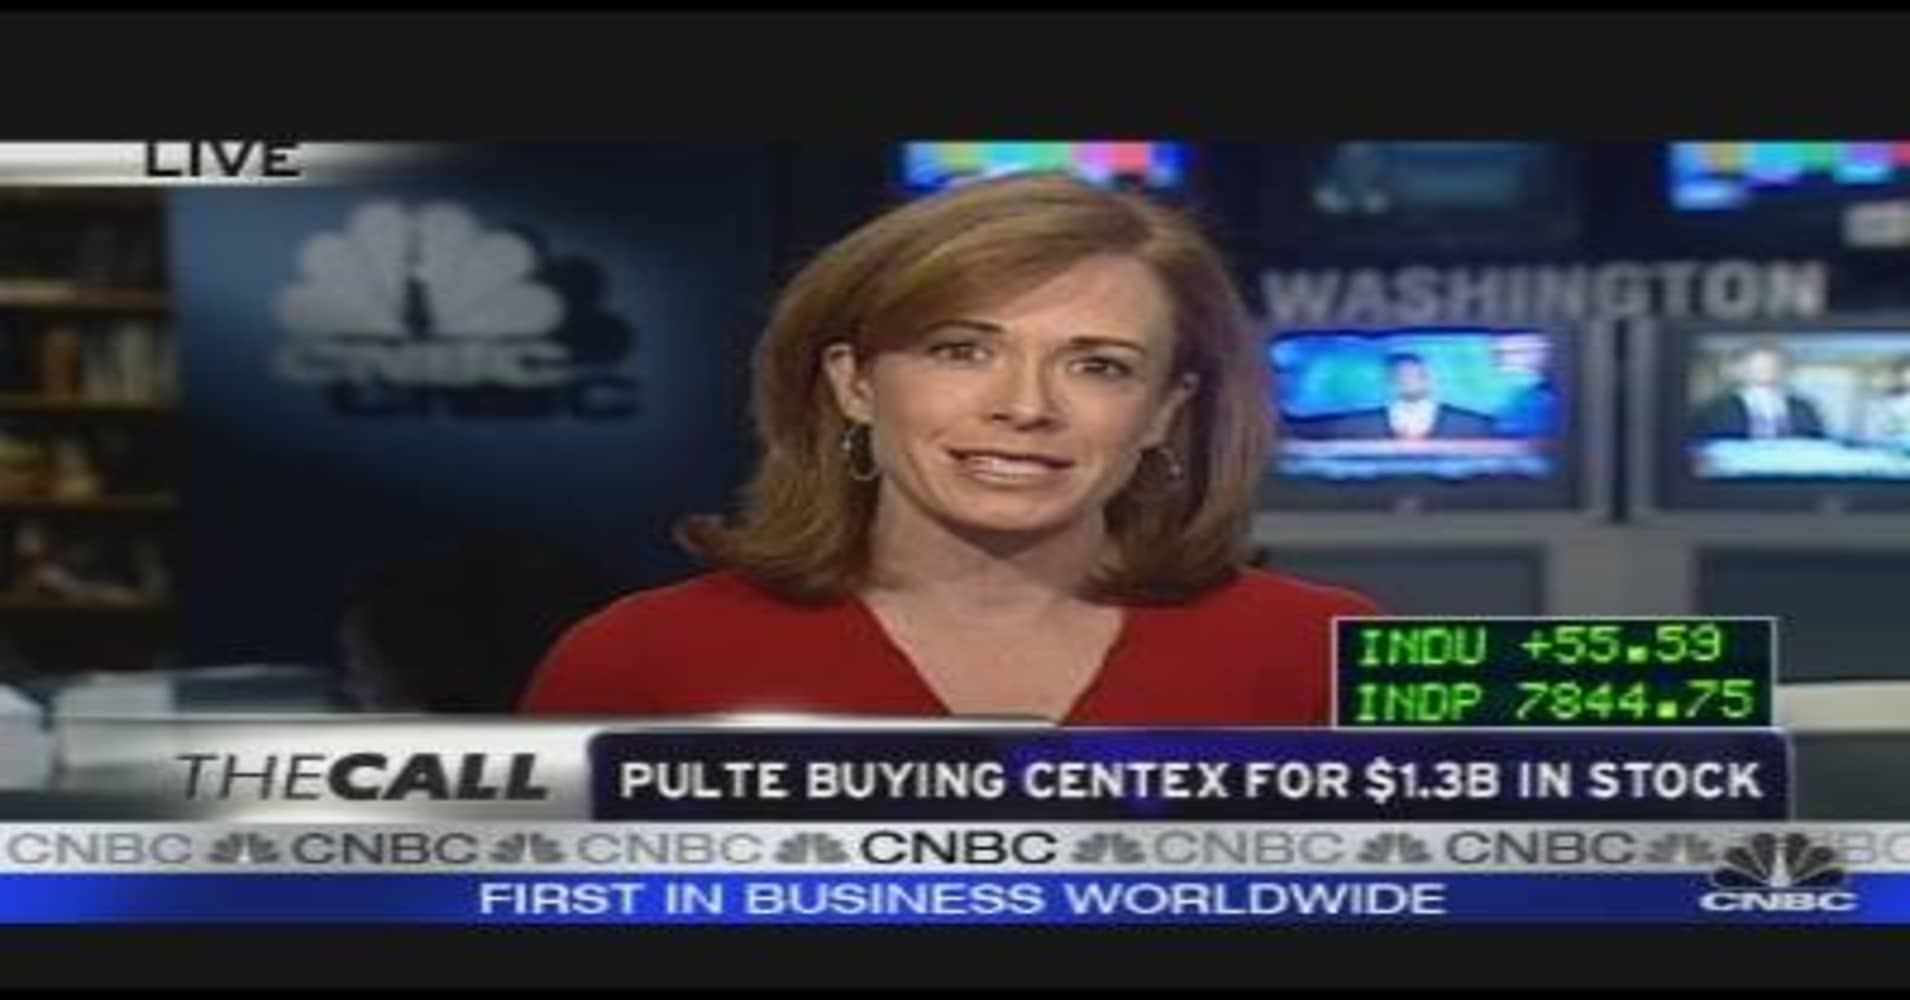 Pulte Buying Centex